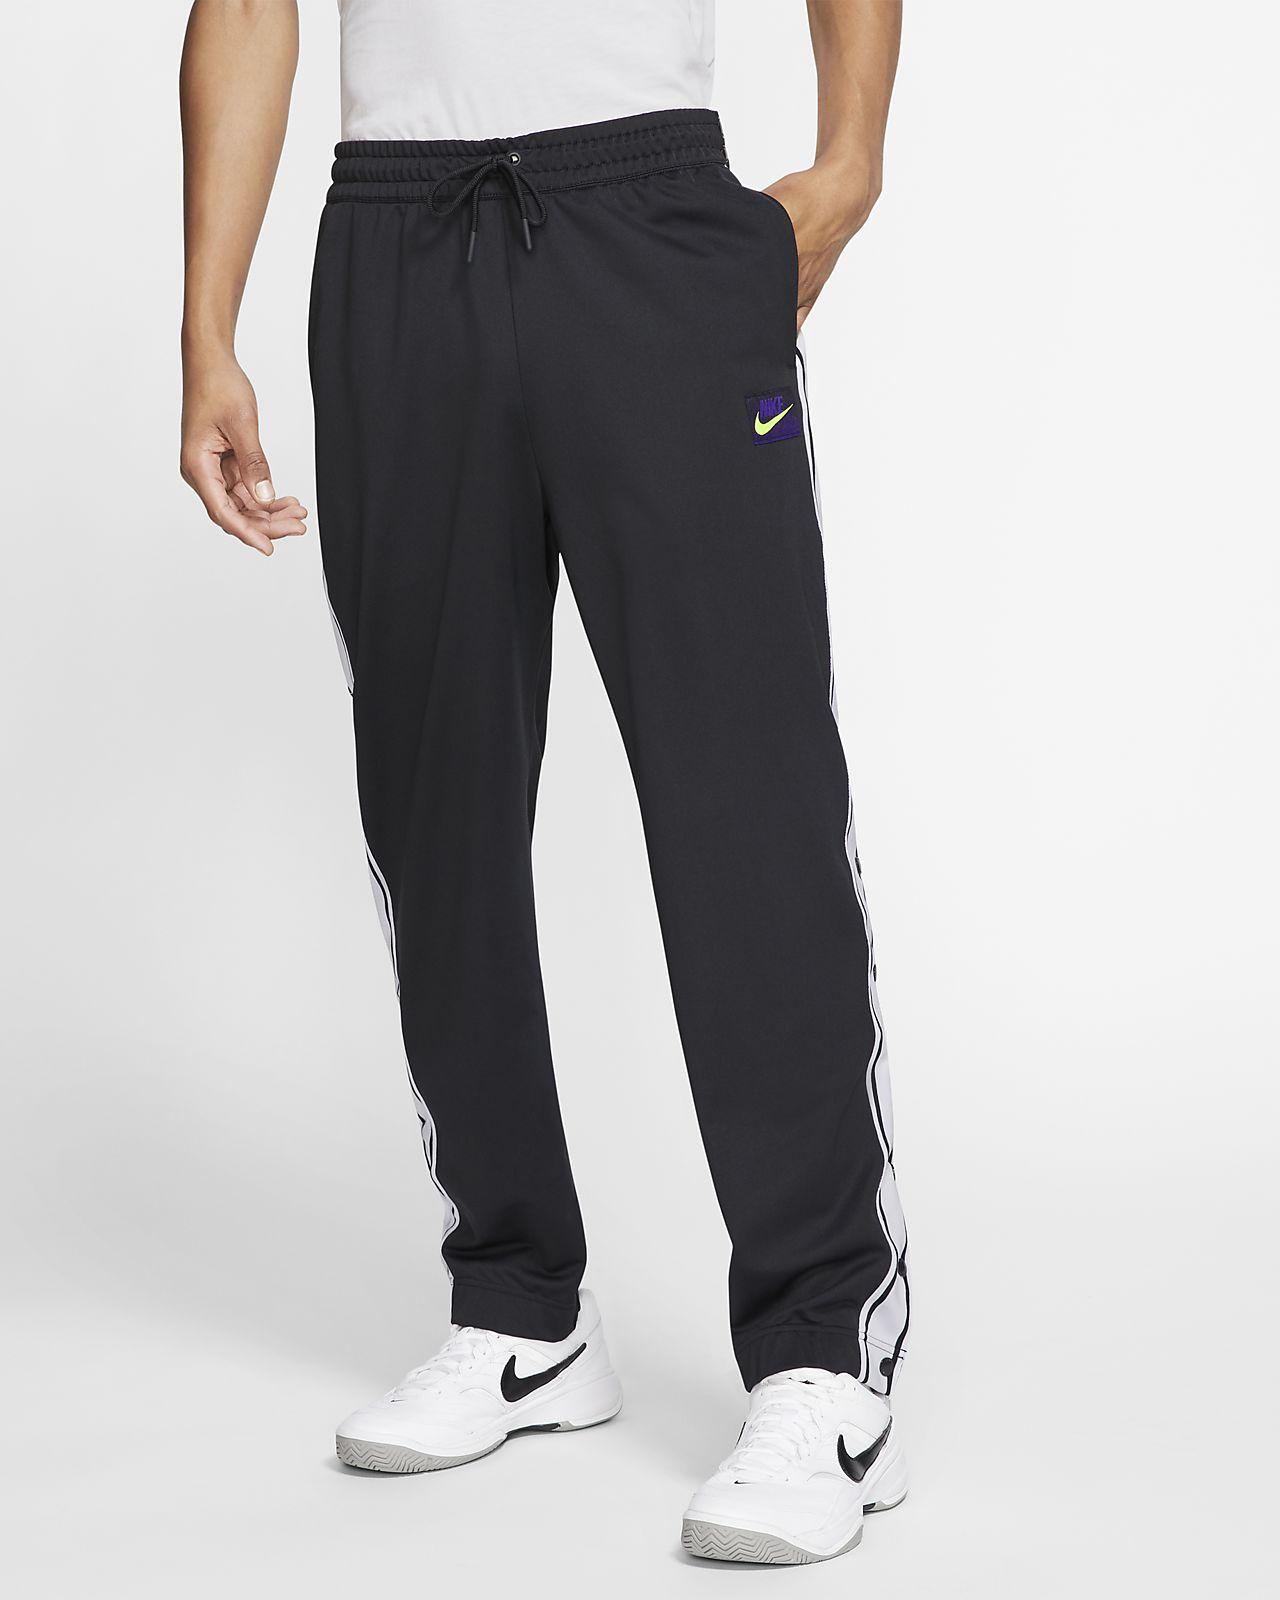 NikeCourt Slam Pantalons de tennis - Home